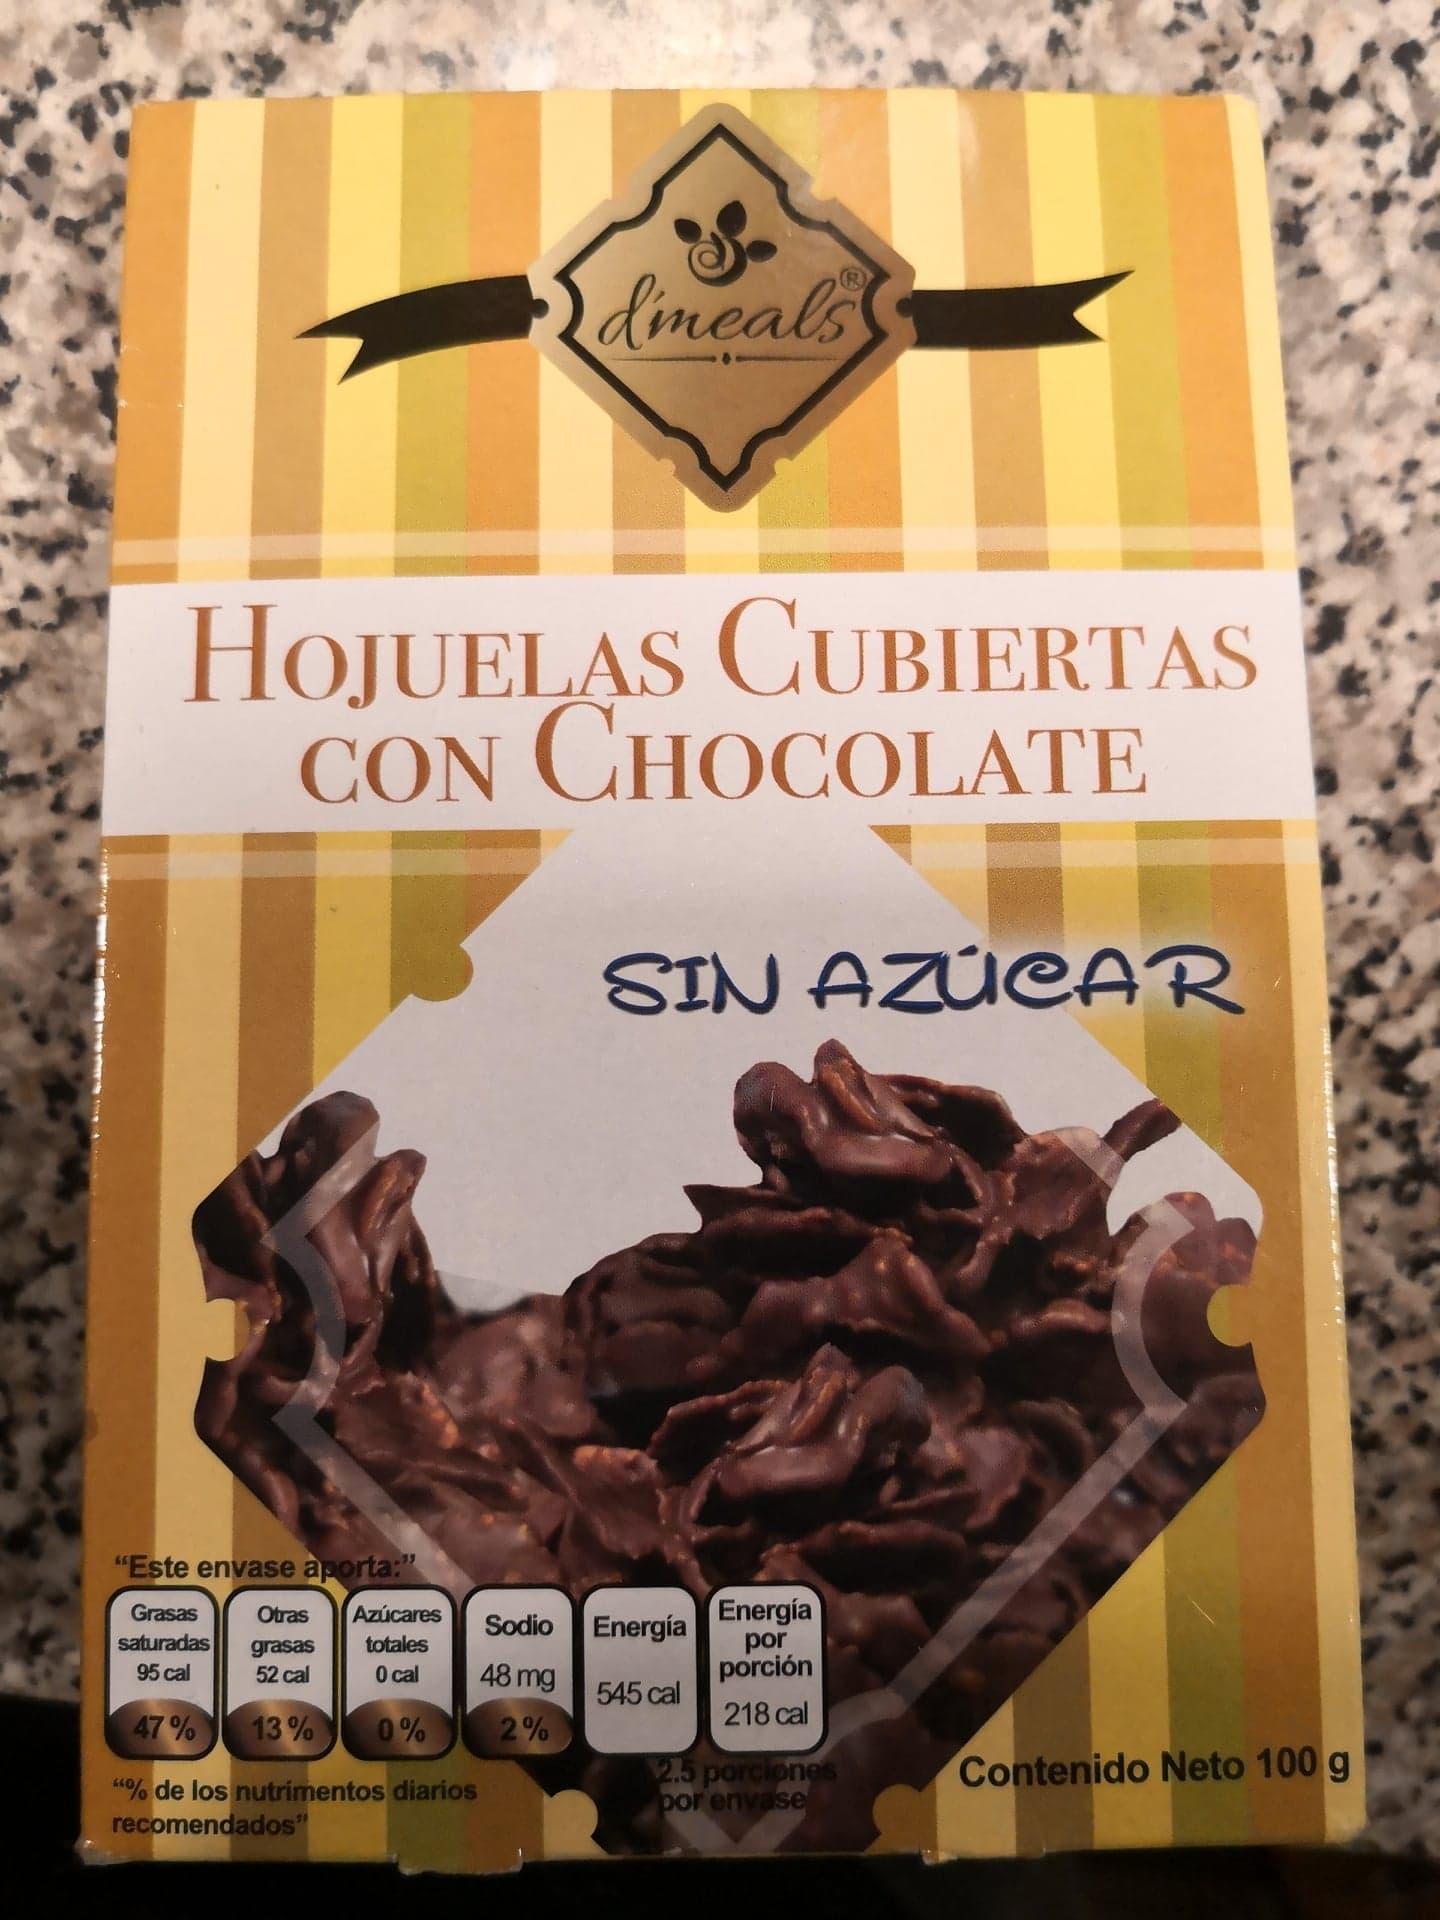 Superama Coyoacán CDMX: Hojuelas de chocolate sin azúcar d'meals